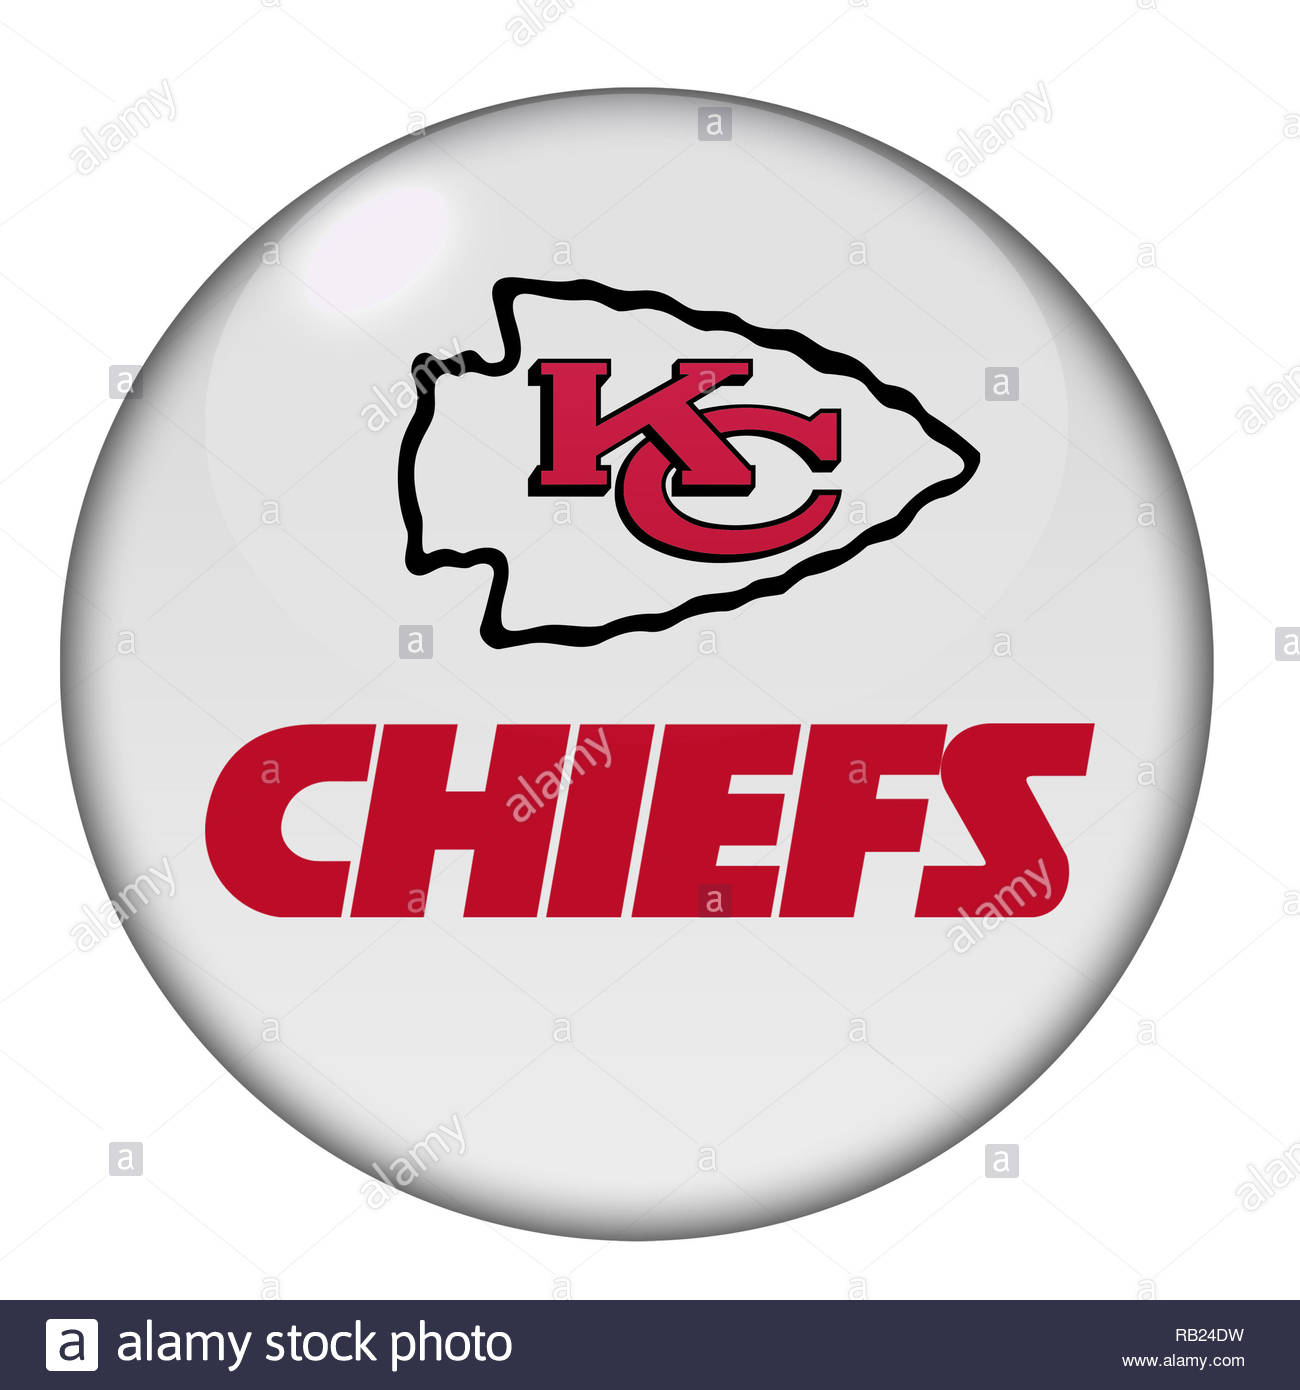 Kansas City Chiefs logo sign - Stock Image